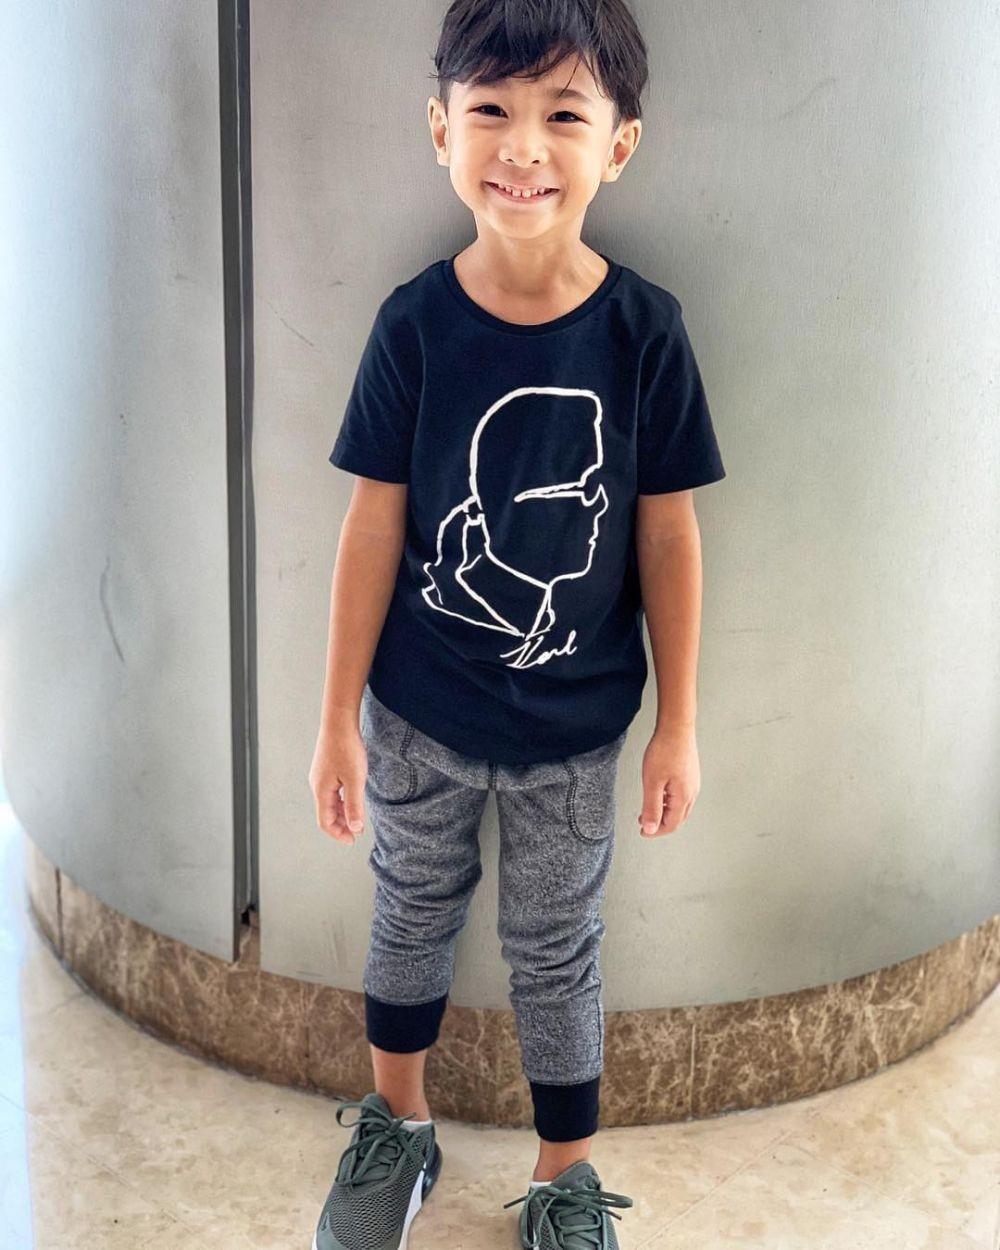 10 Potret Seth Ananda, Anak Marcell Siahaan yang Bule Abis